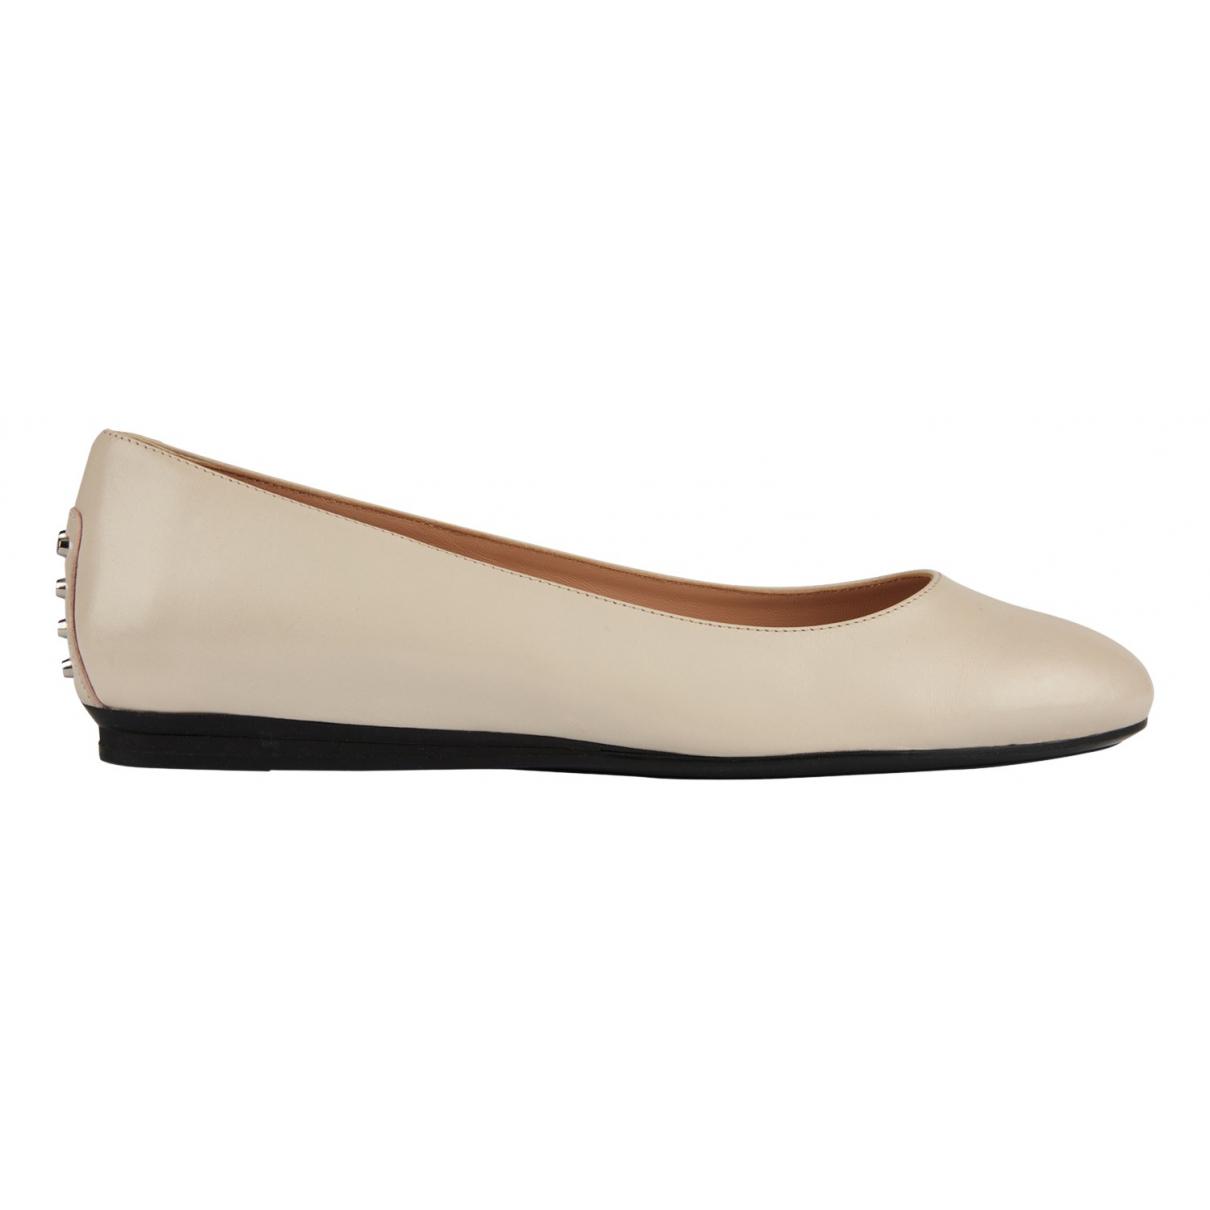 Tod's N Ecru Leather Flats for Women 4.5 UK